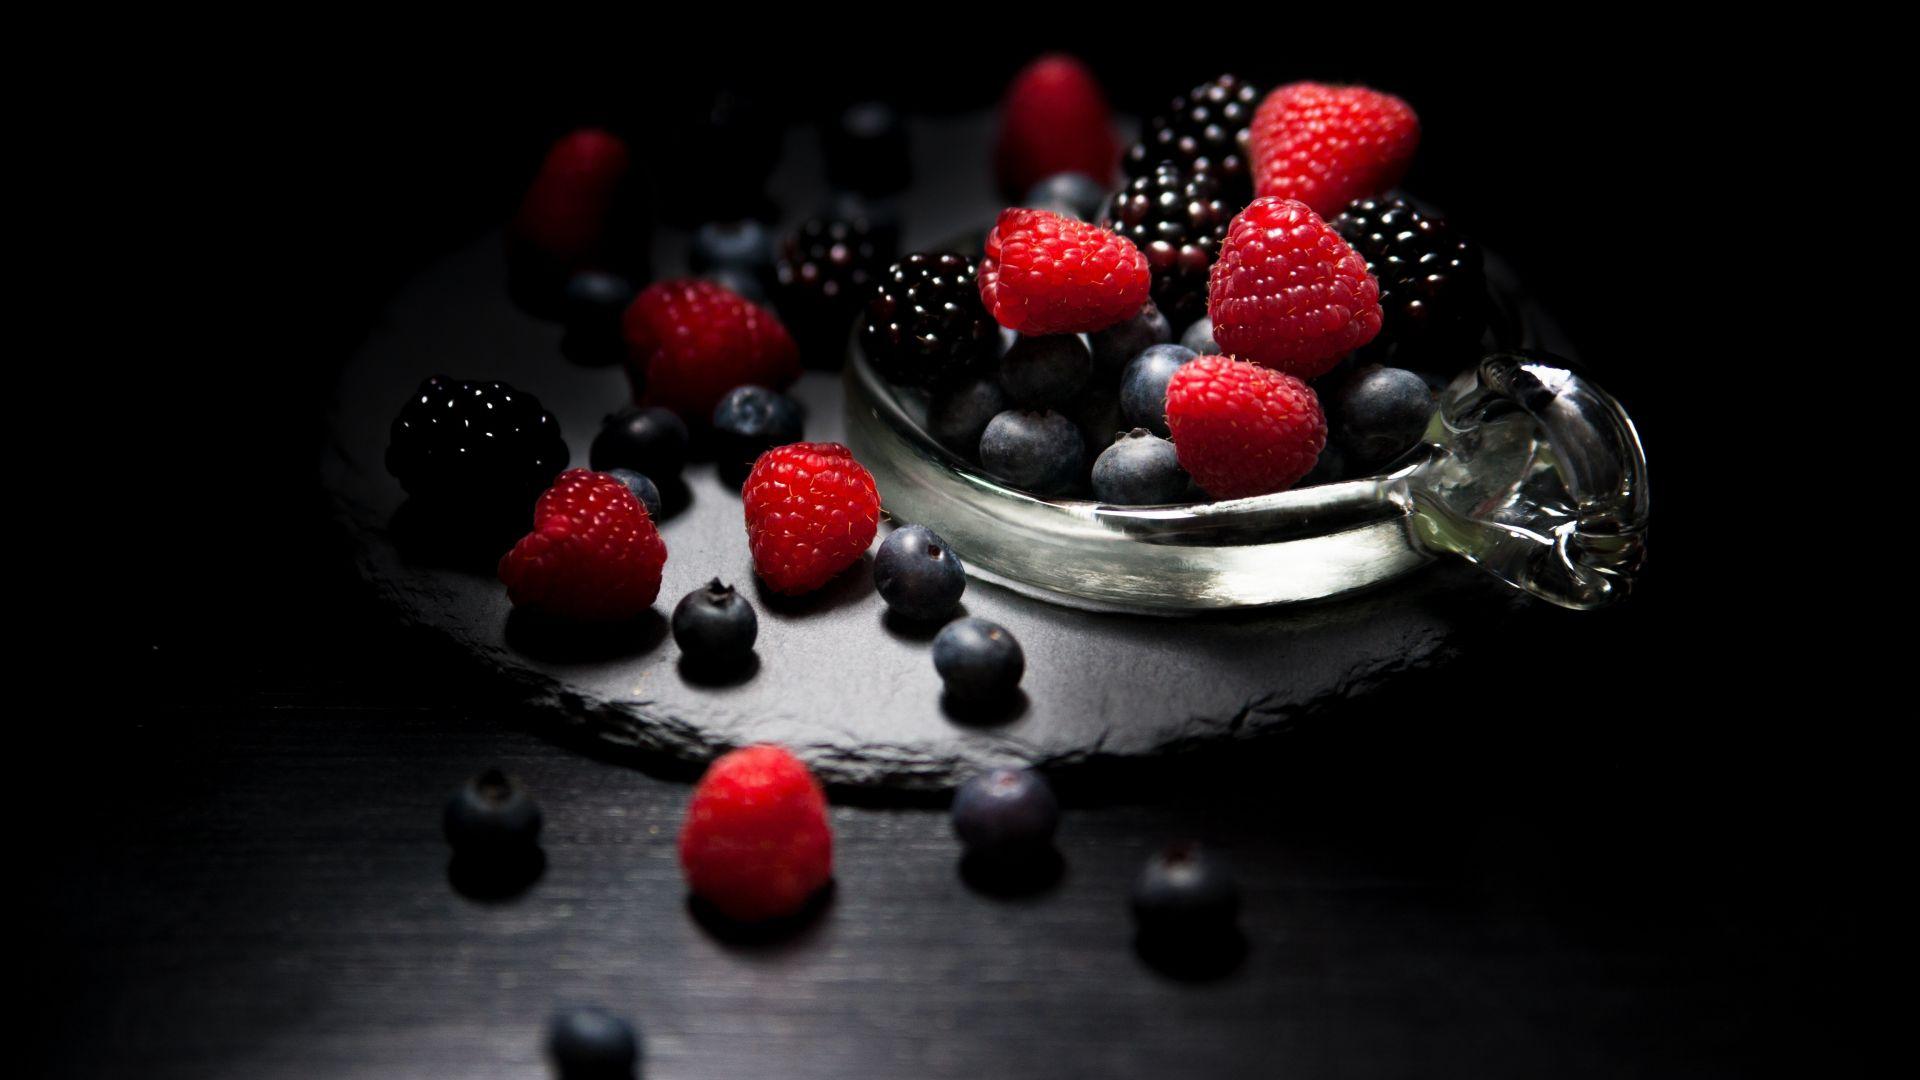 Wallpaper Dark mood, food, fruits, blueberry, raspberry, blackberry, 4k